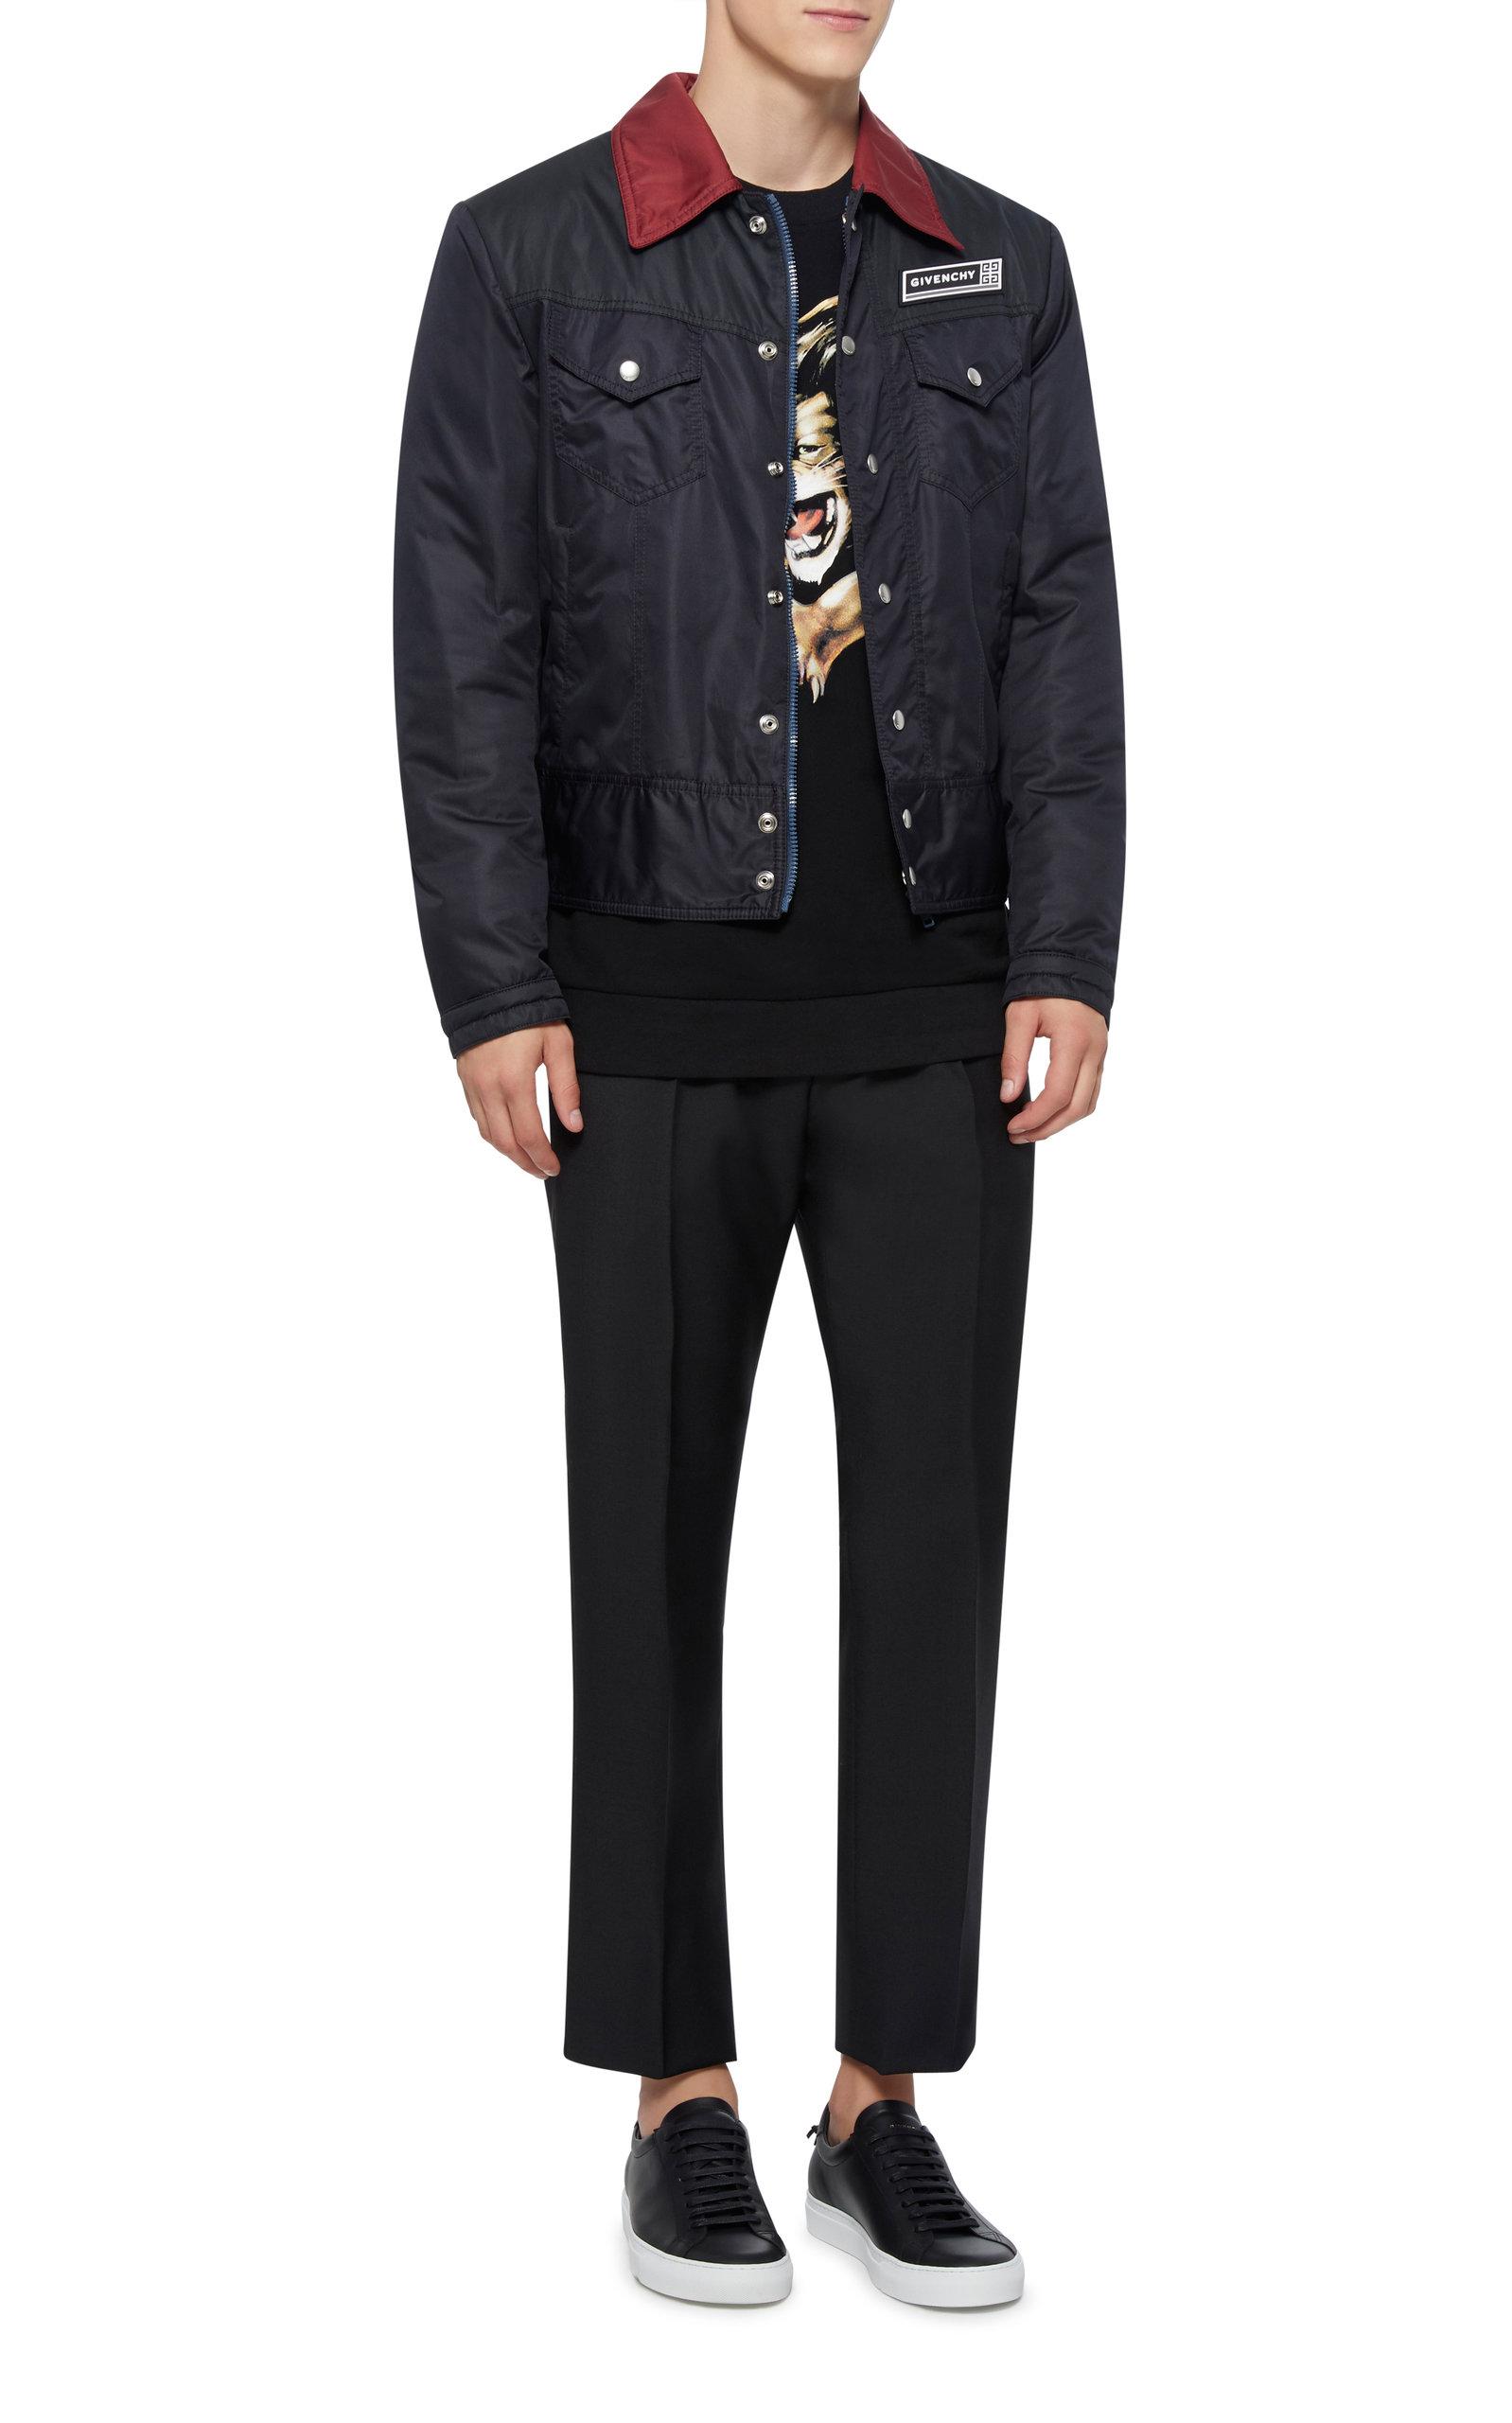 Appliquéd Moda Shell Tone Jacket Givenchy Operandi Bomber By Two 5FfBqzxq